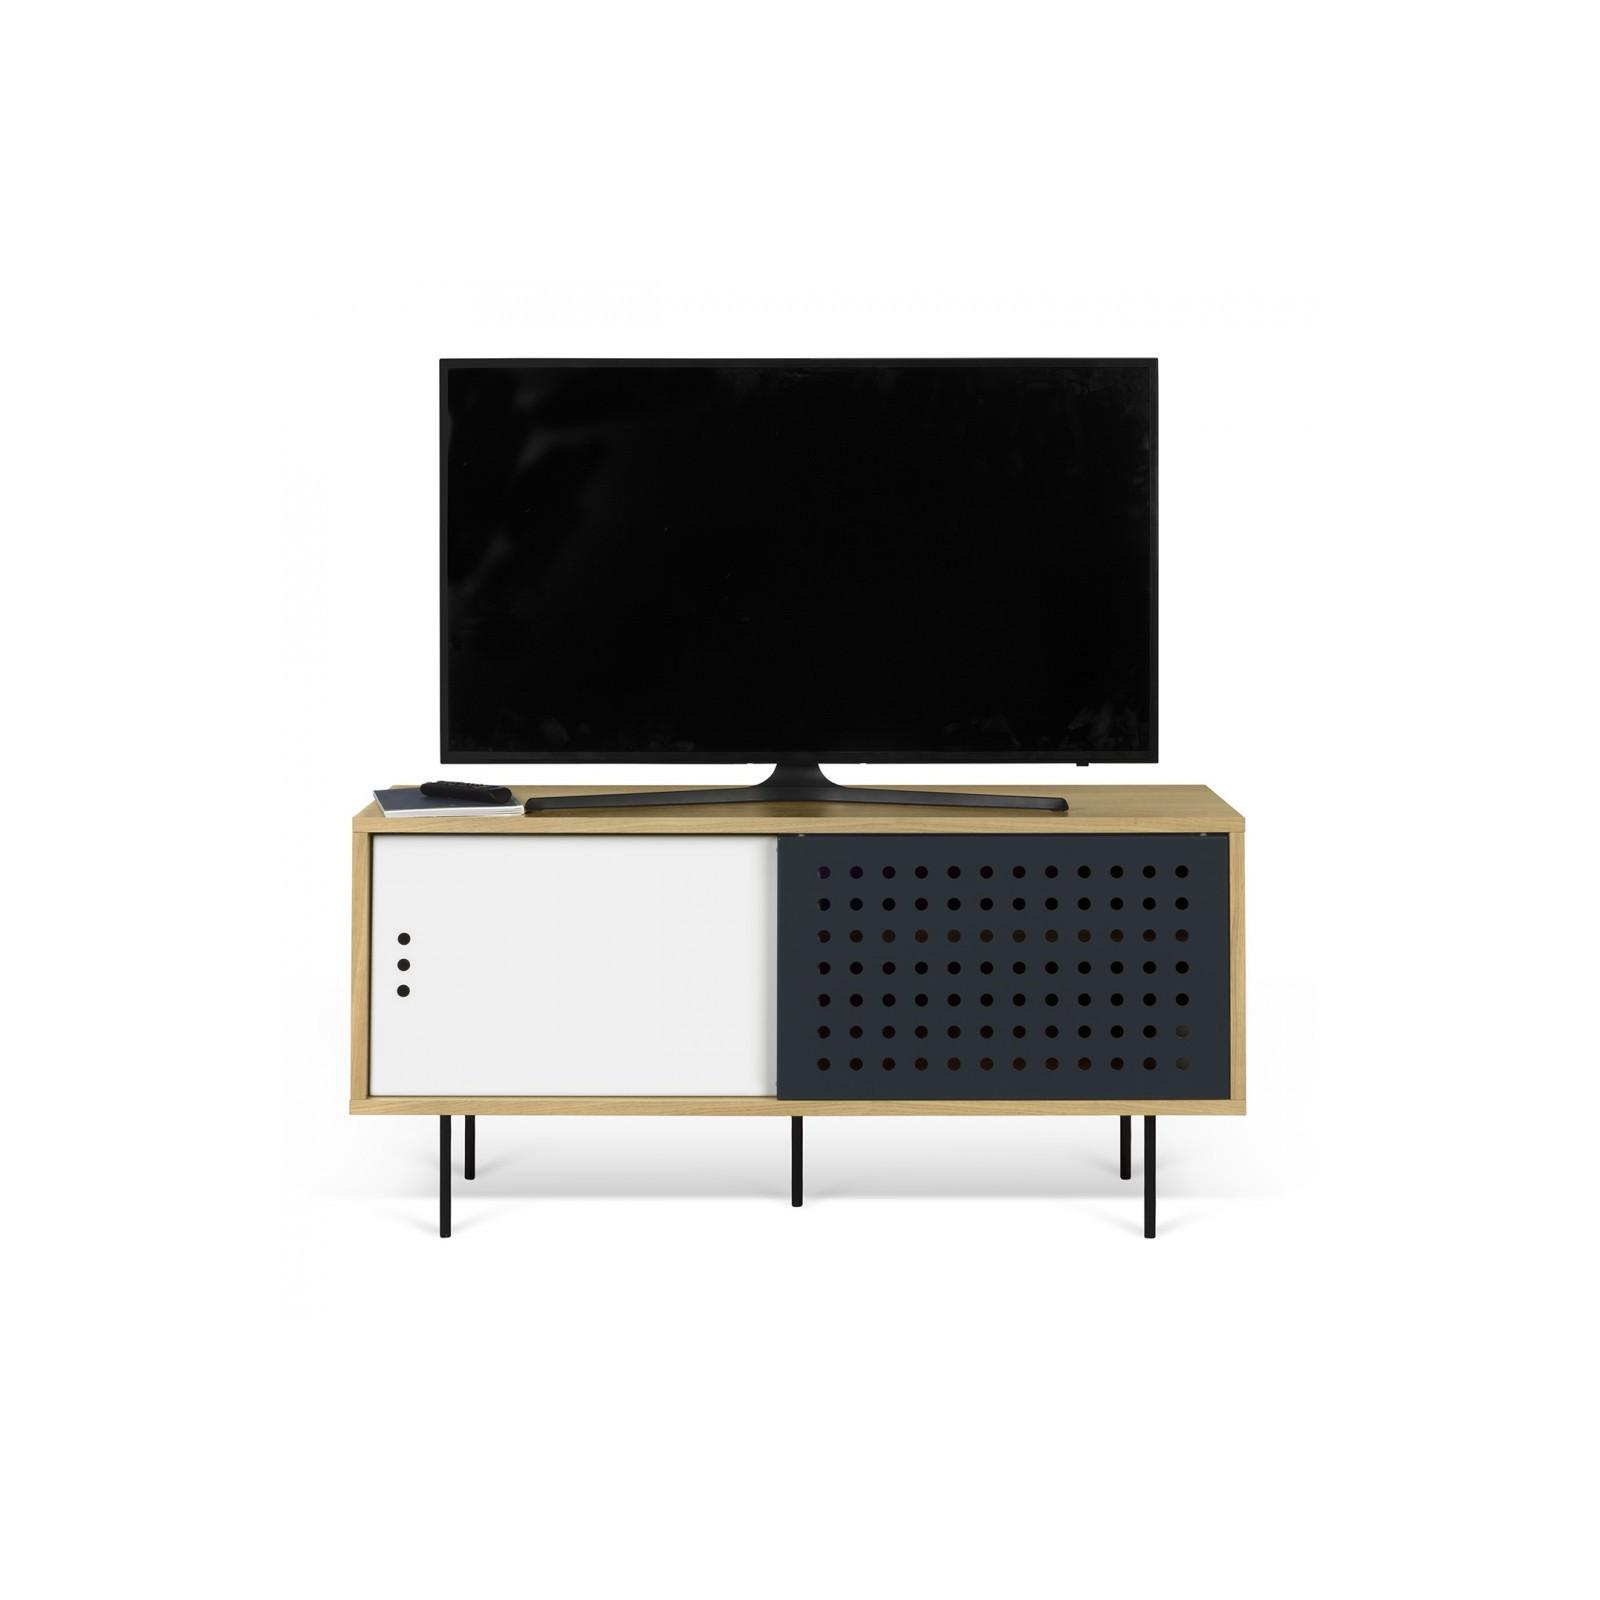 Meuble tv danois points arne concept for Code meubles concept